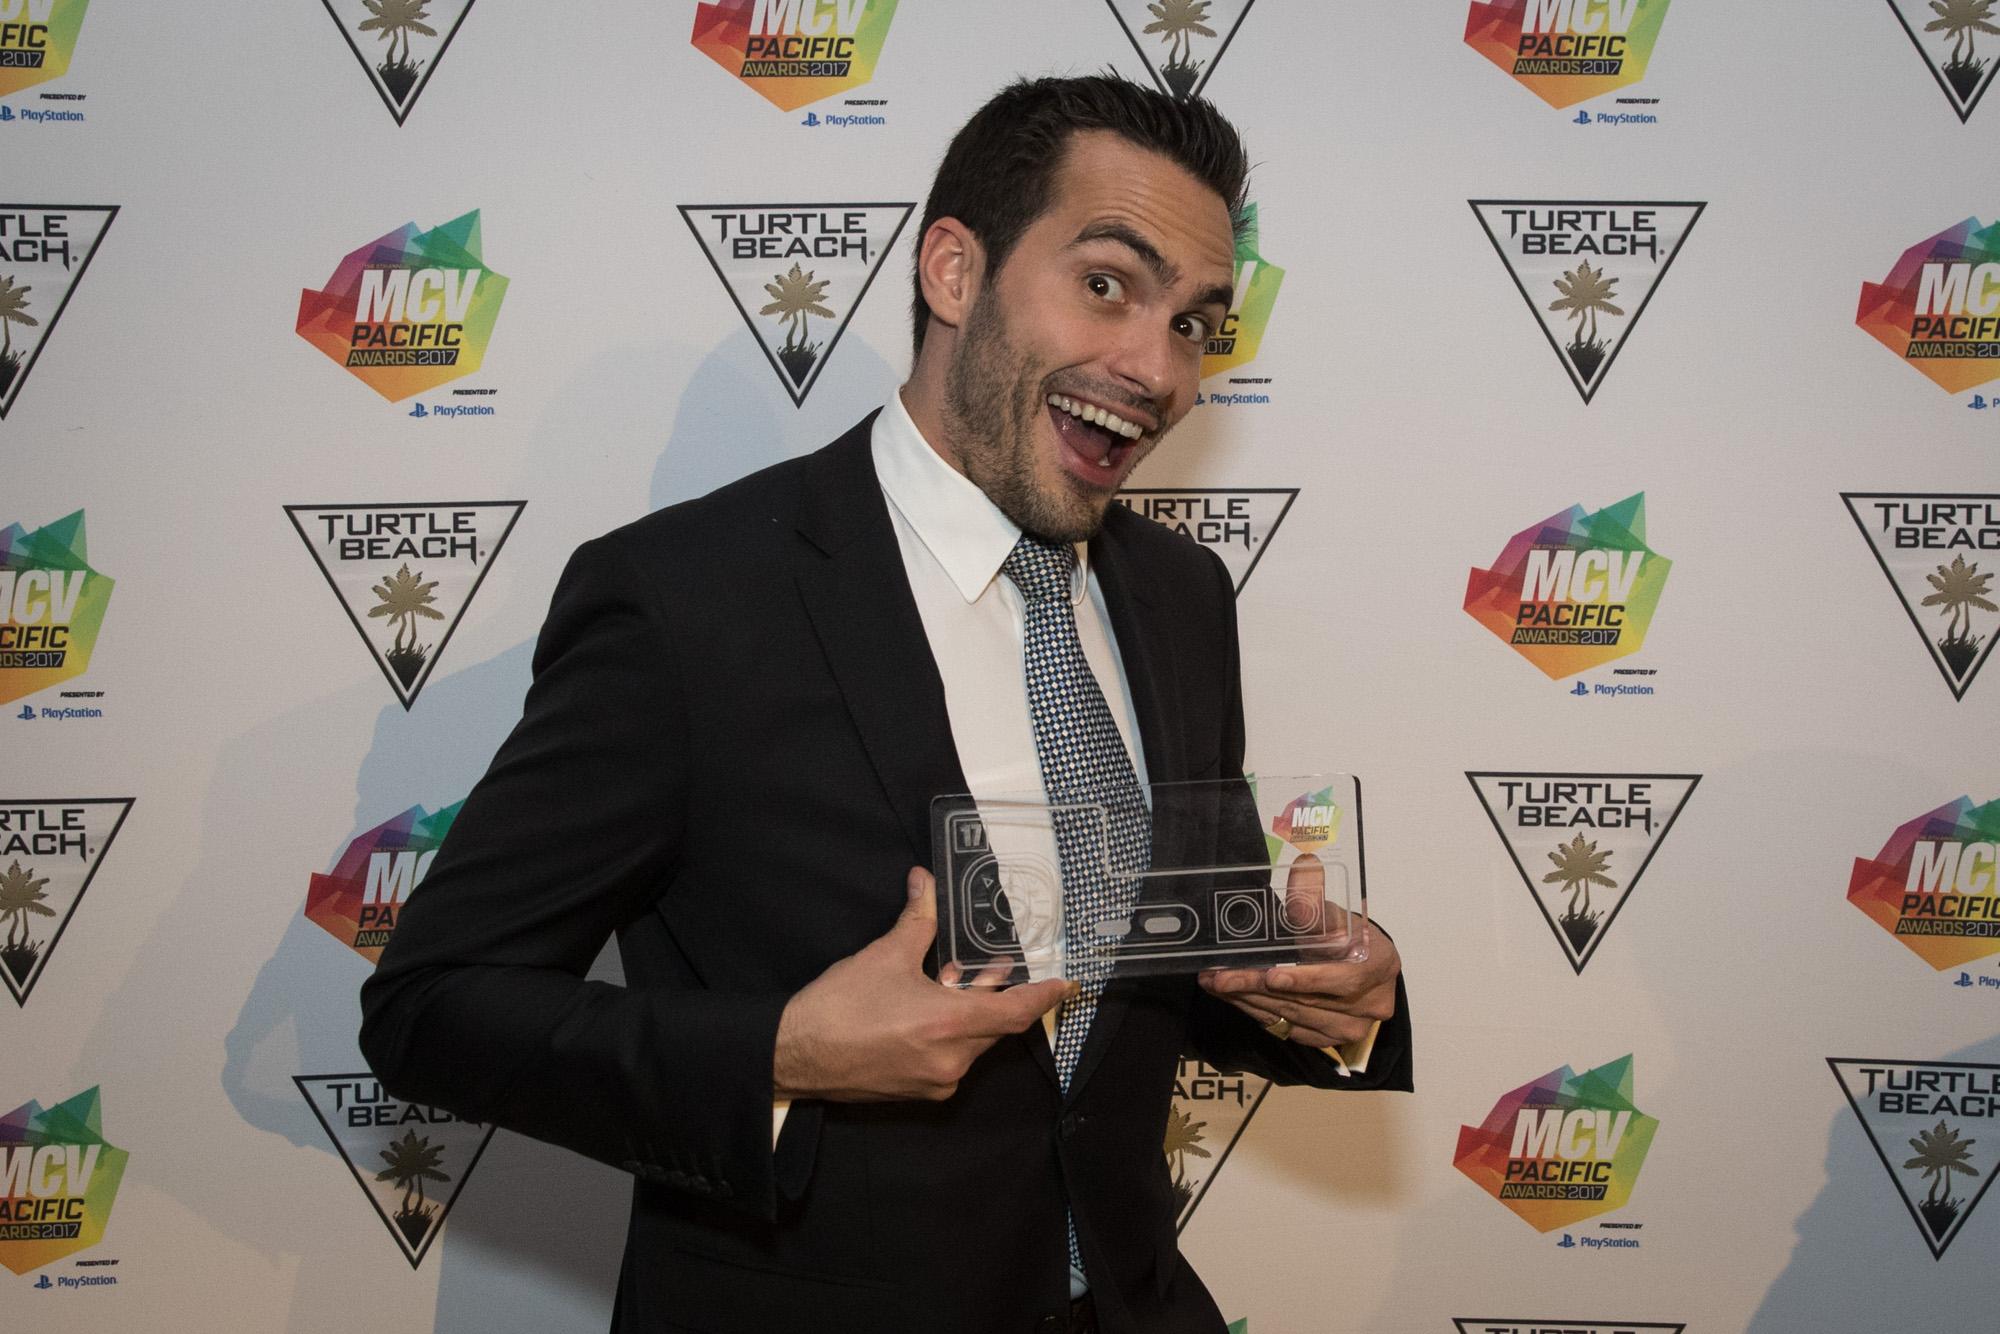 MCV_Pacific_Awards_1_June_17_PS_076.jpg